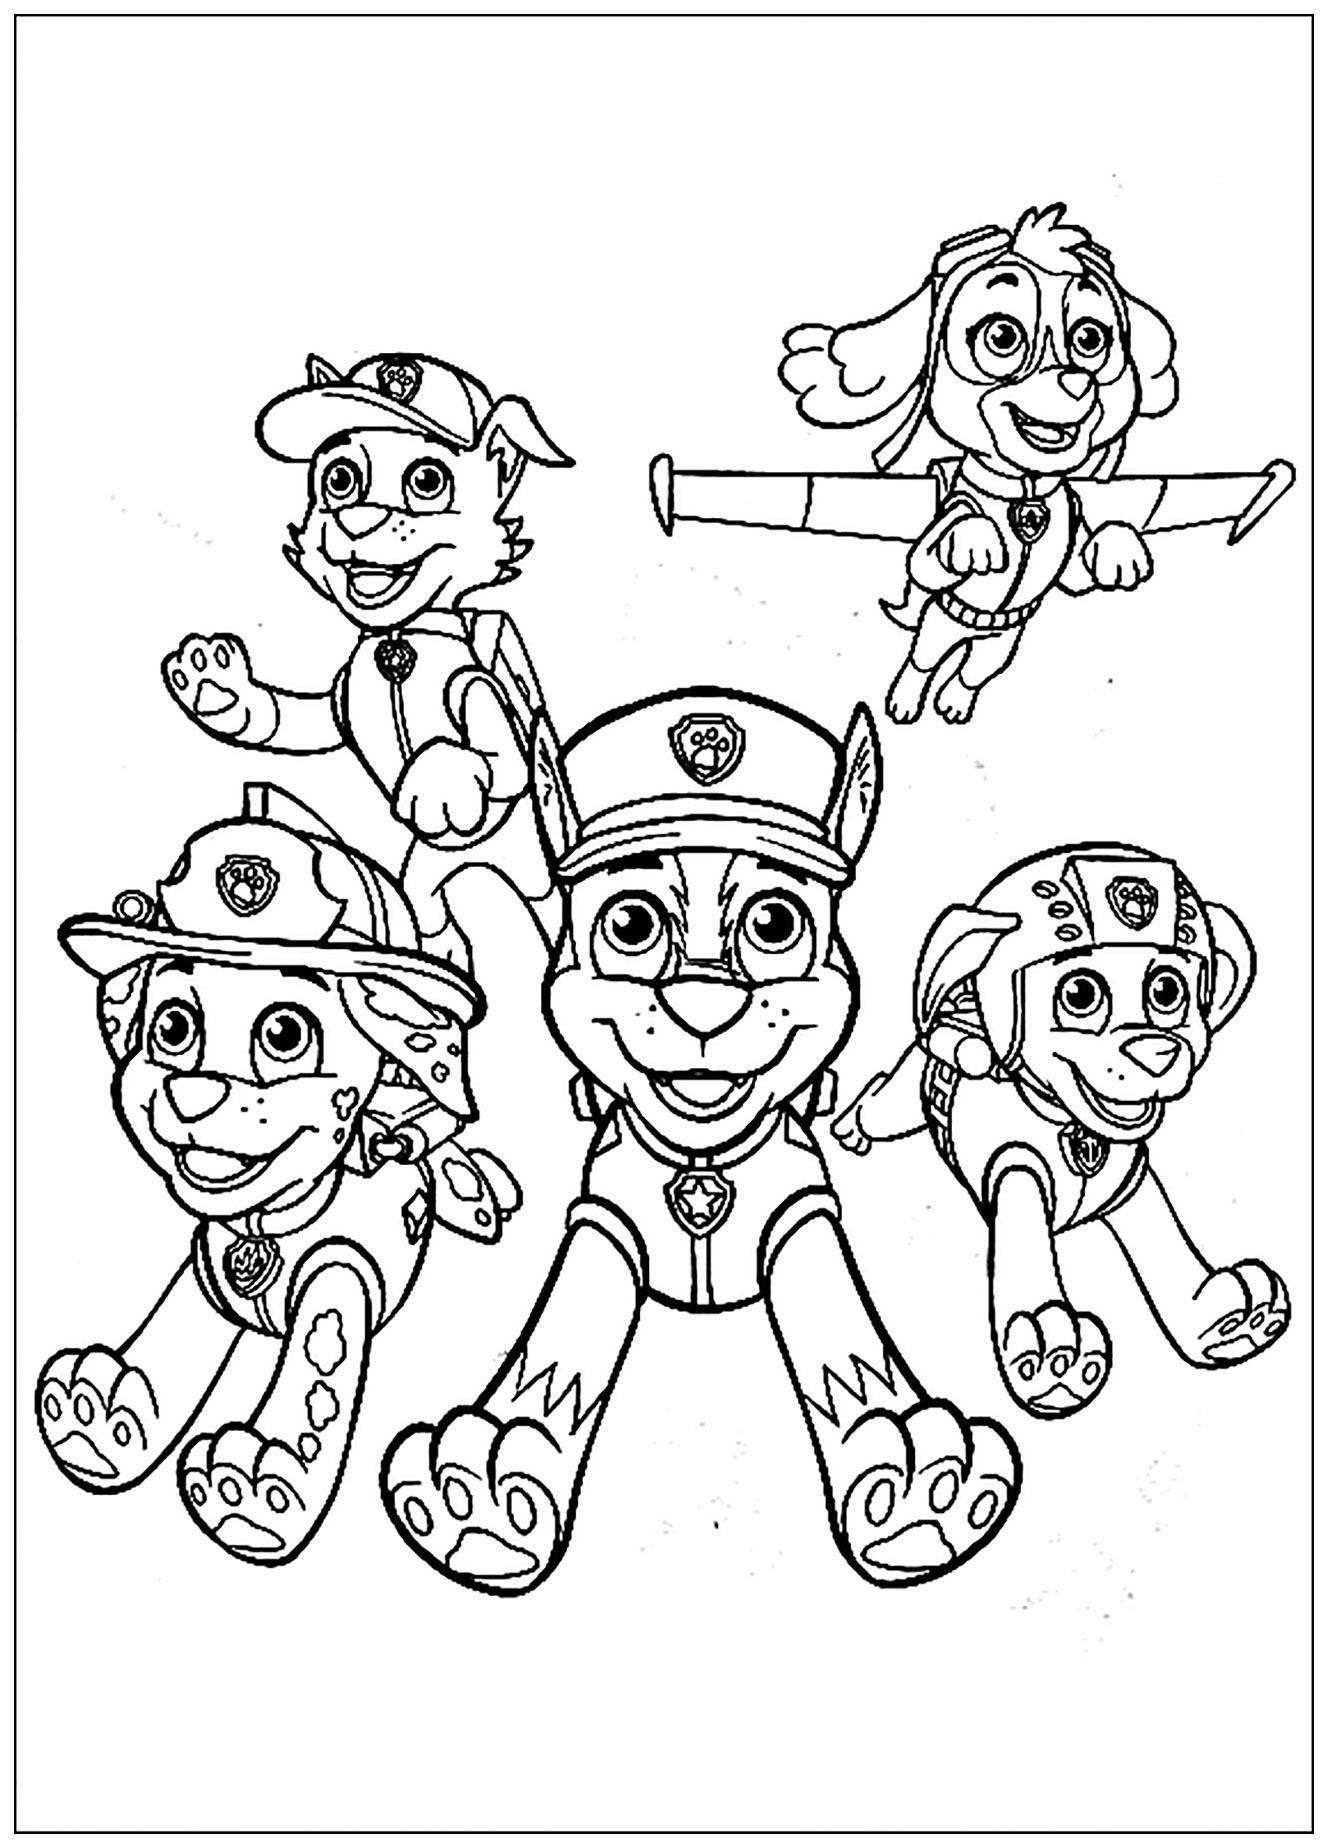 image=pat patrouille coloriage pat patrouille equipe 1